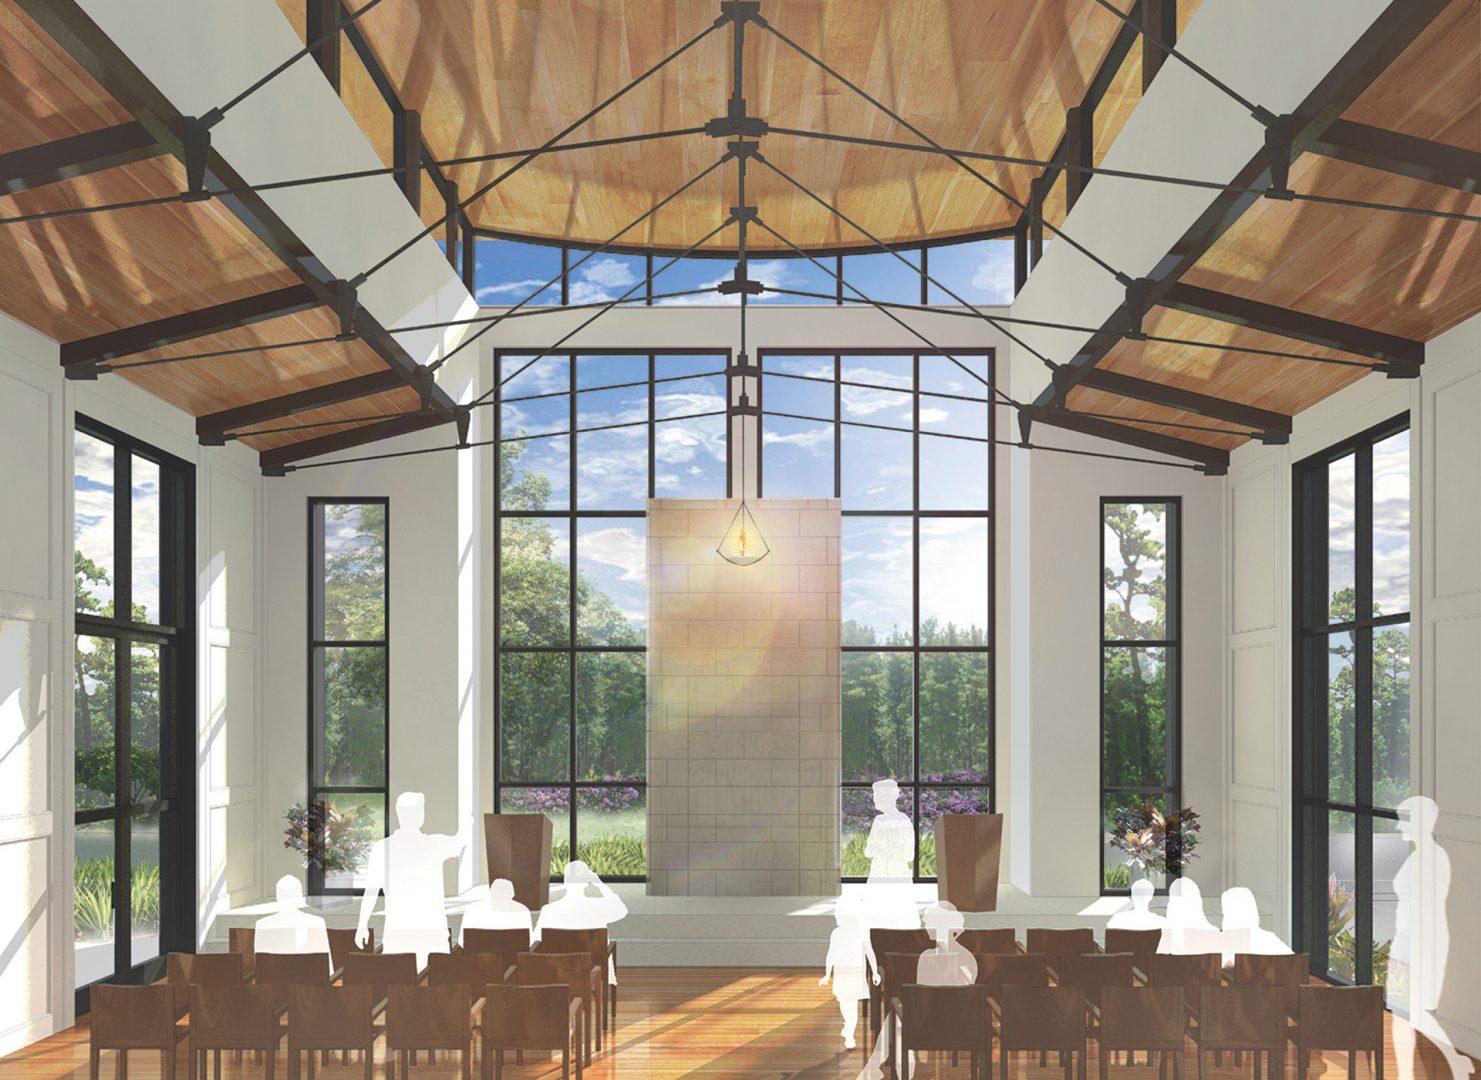 Chabad of Charleston, Interior Sanctuary Rendering